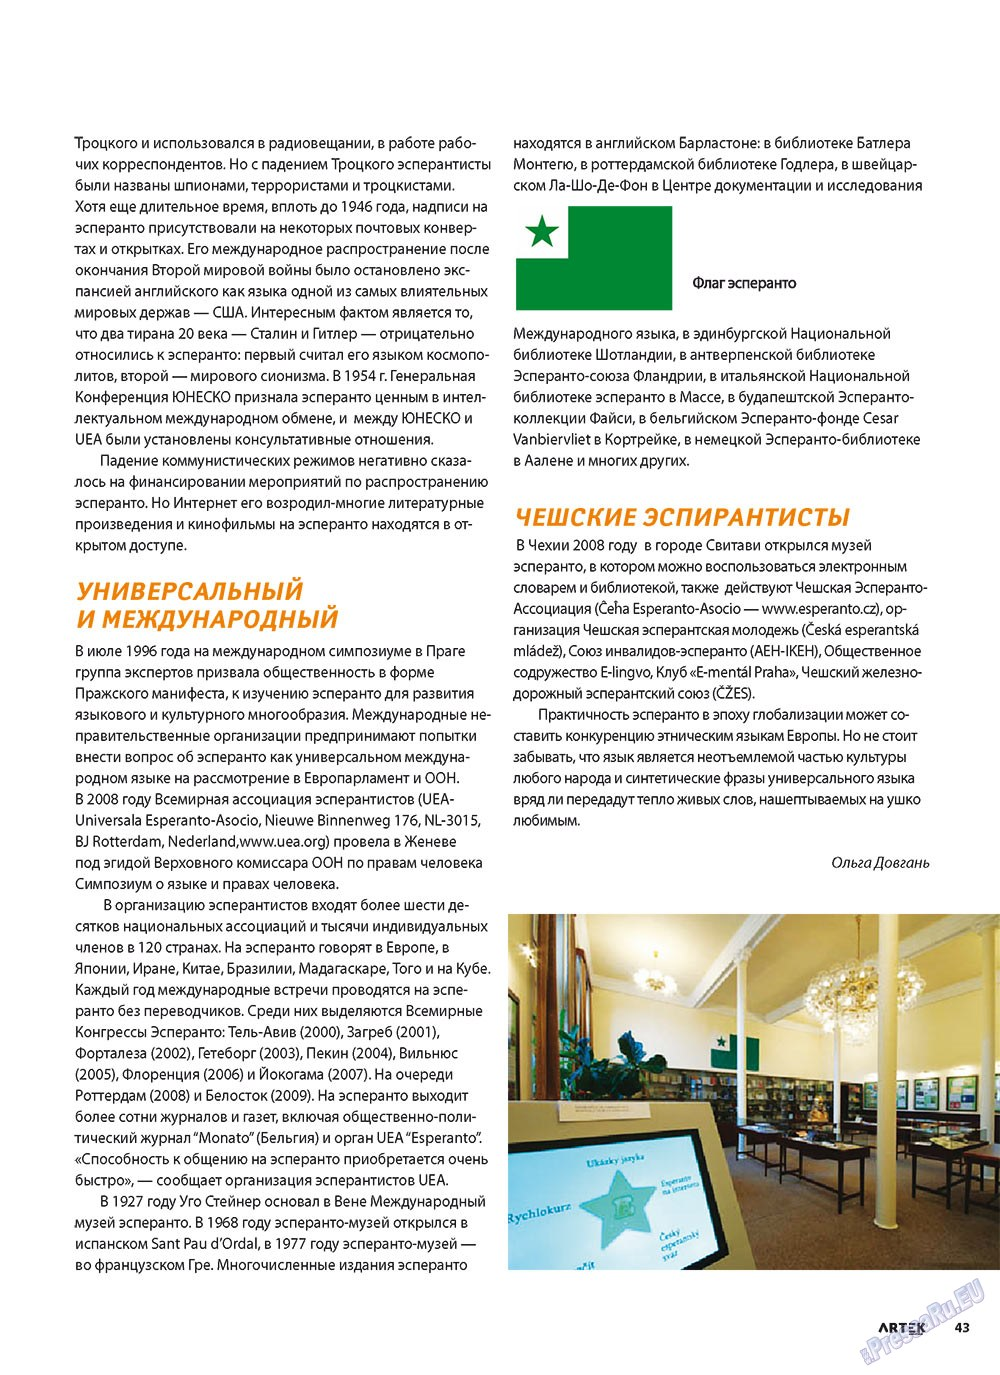 Артек (журнал). 2011 год, номер 1, стр. 45